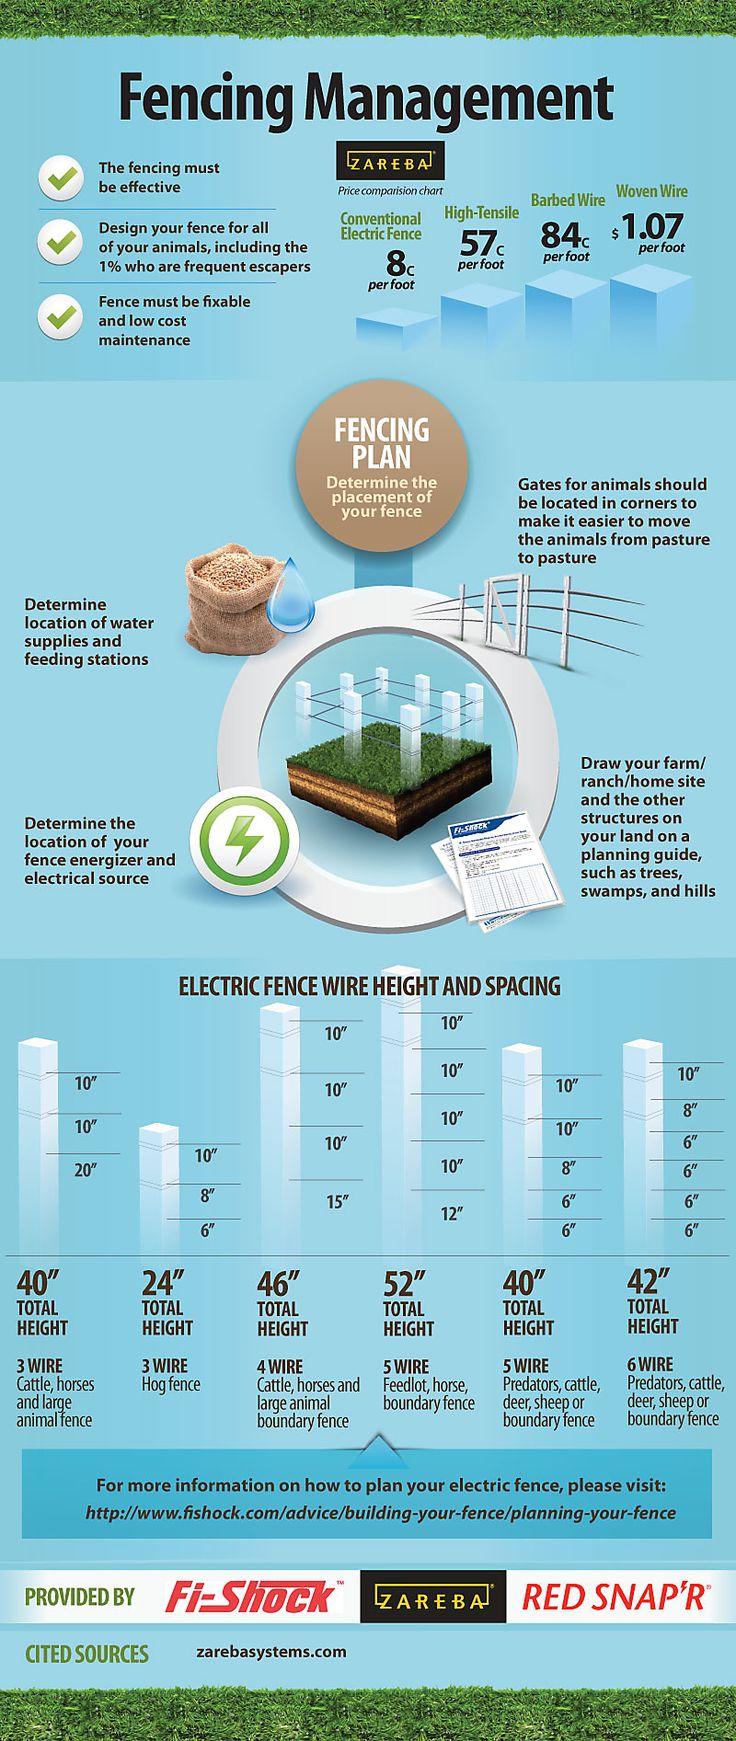 Fencing Management | Zareba Electric Fences